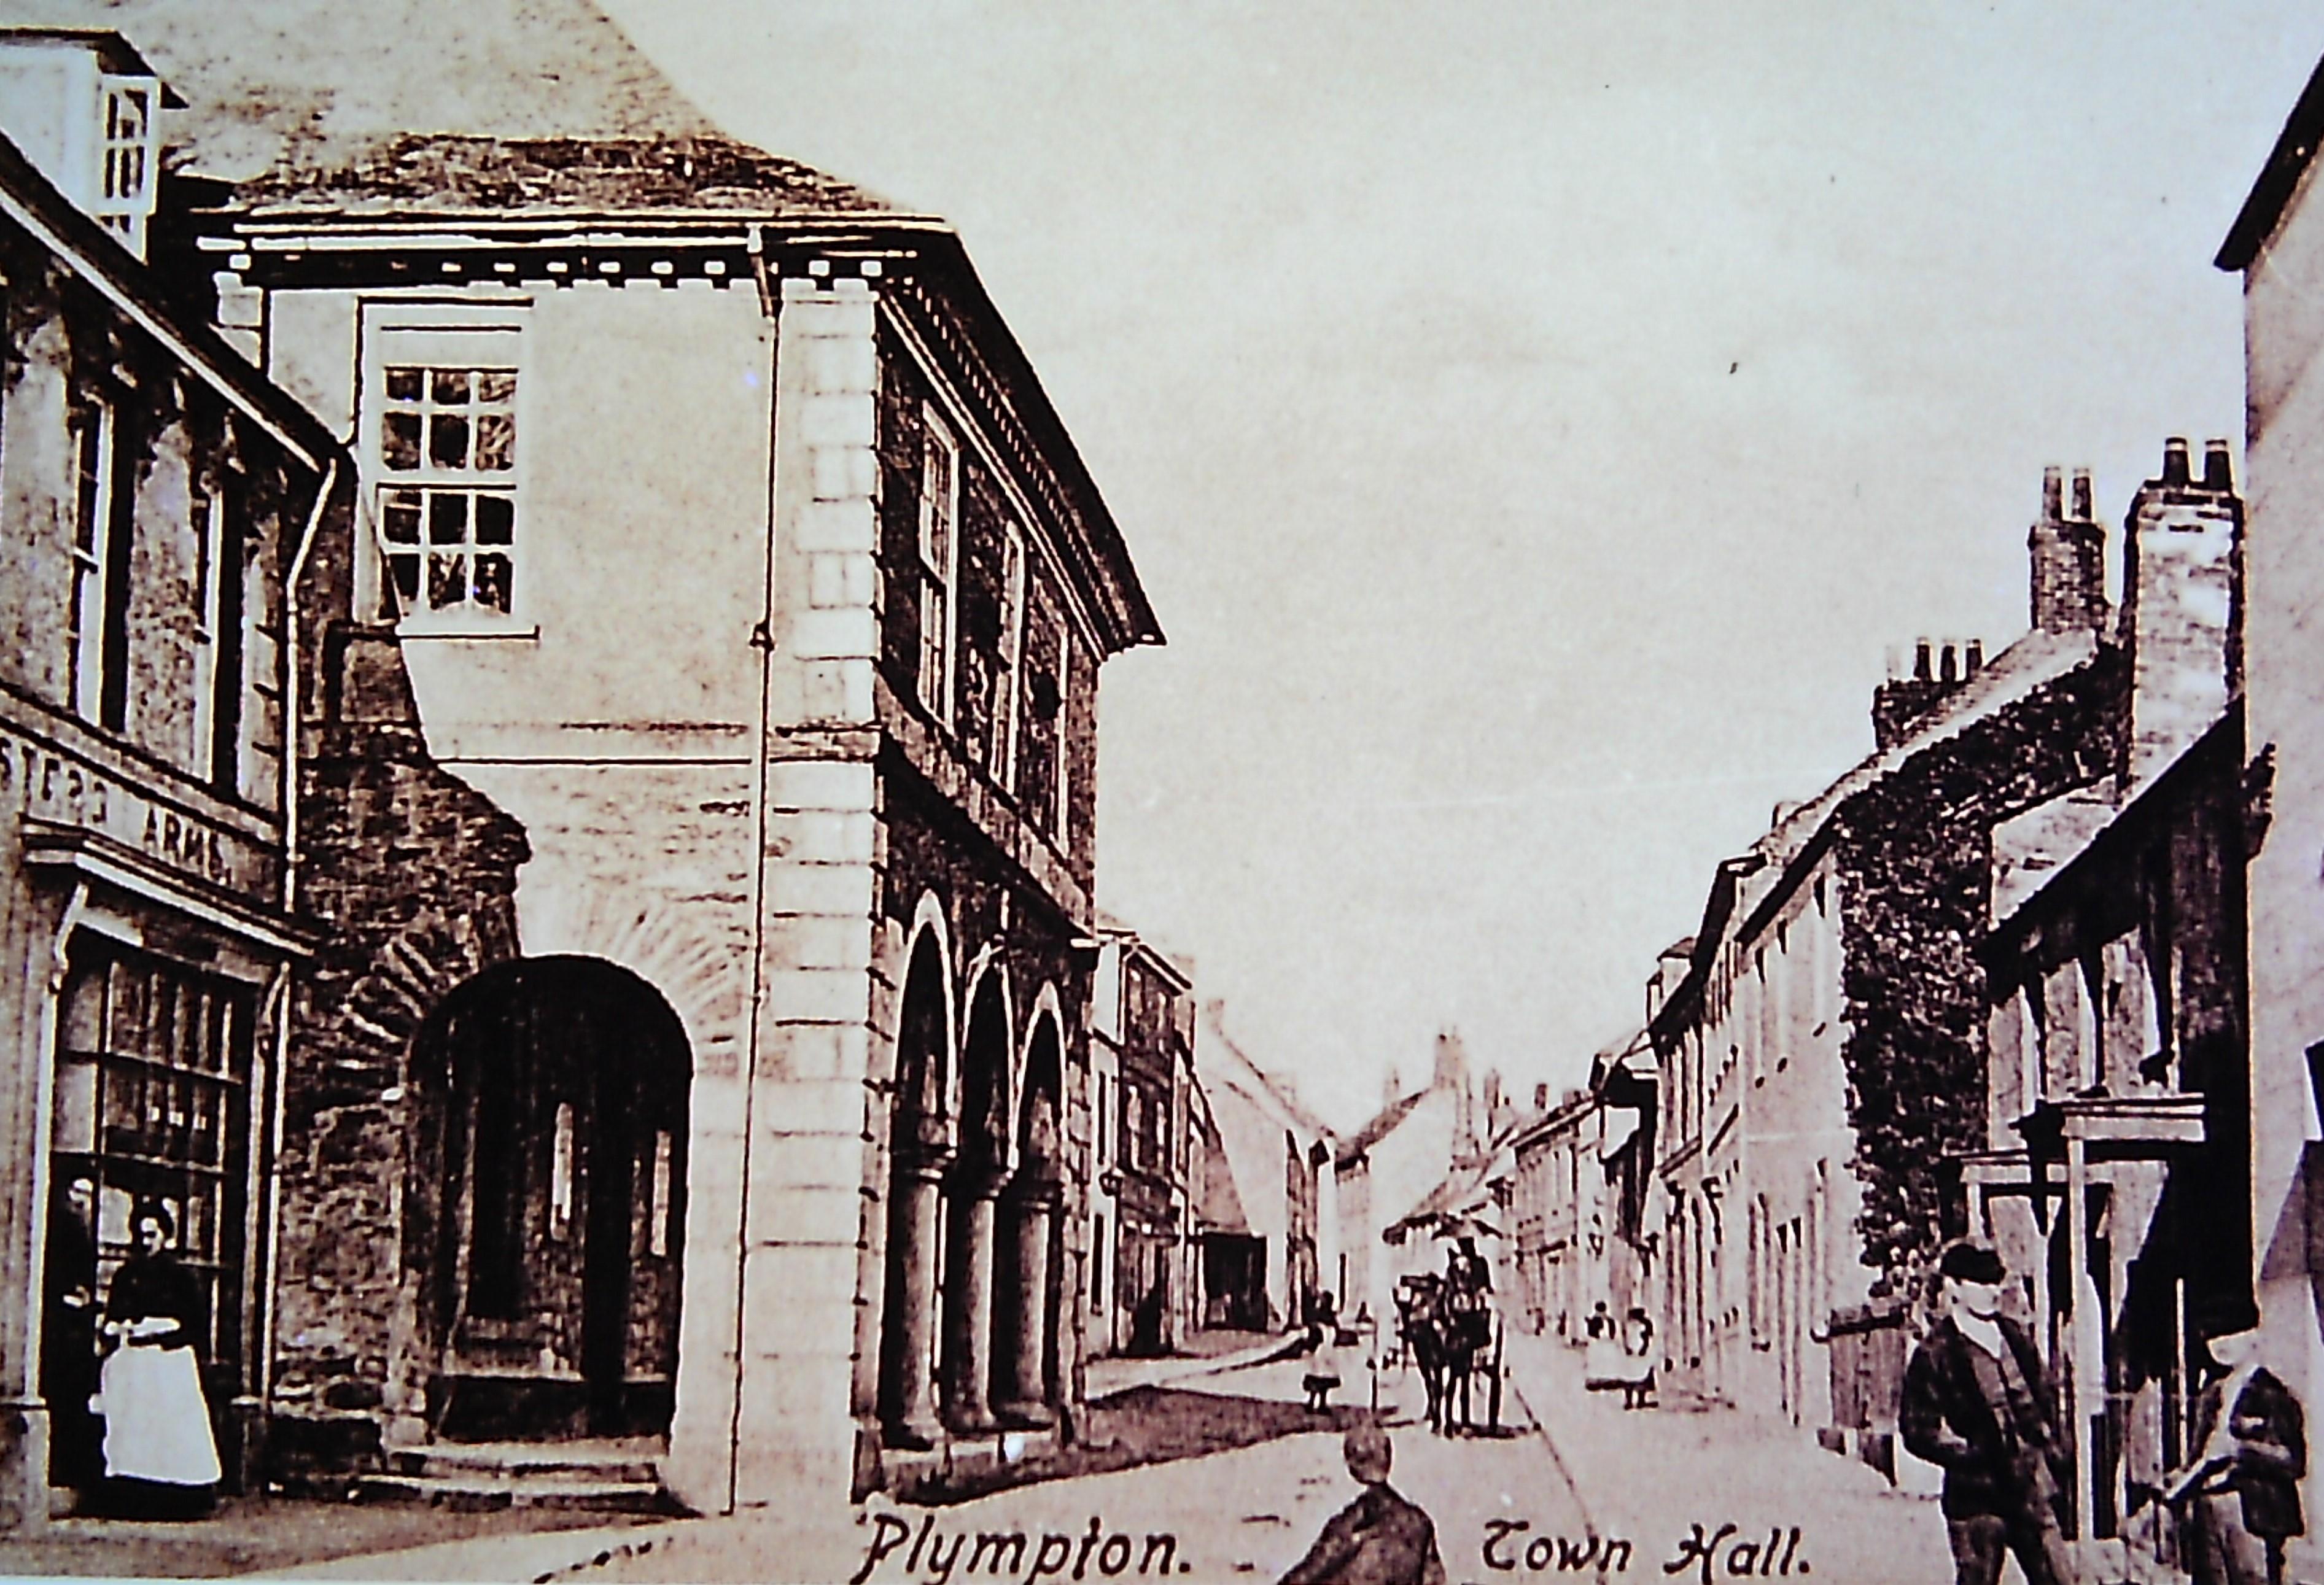 Plympton Town Hall